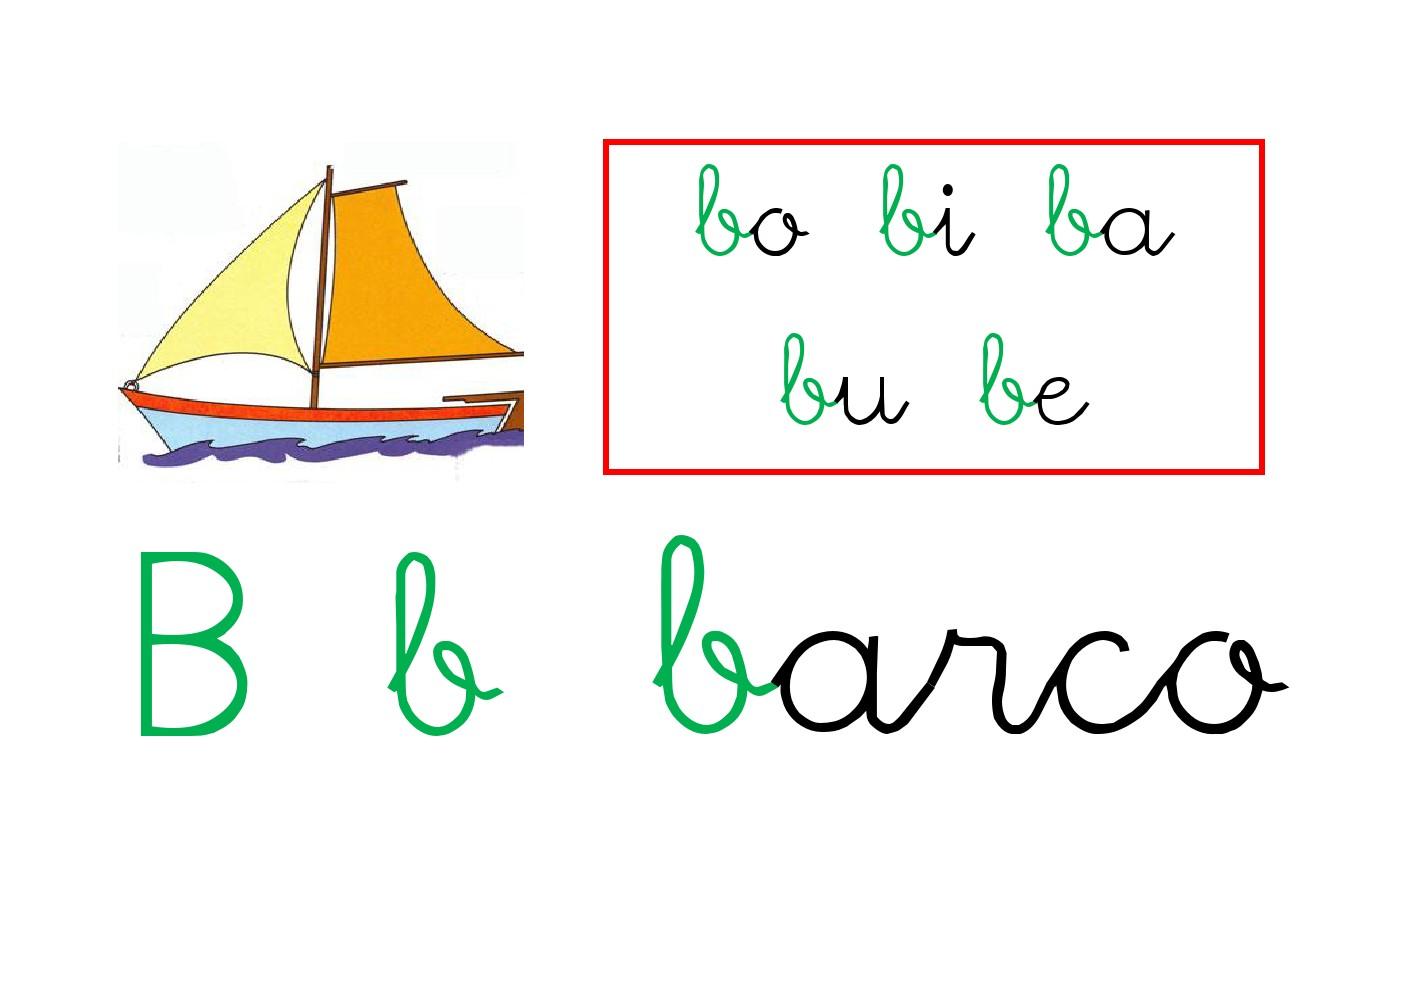 Fichas para aprender a leer por sílabas | Fichas para imprimir